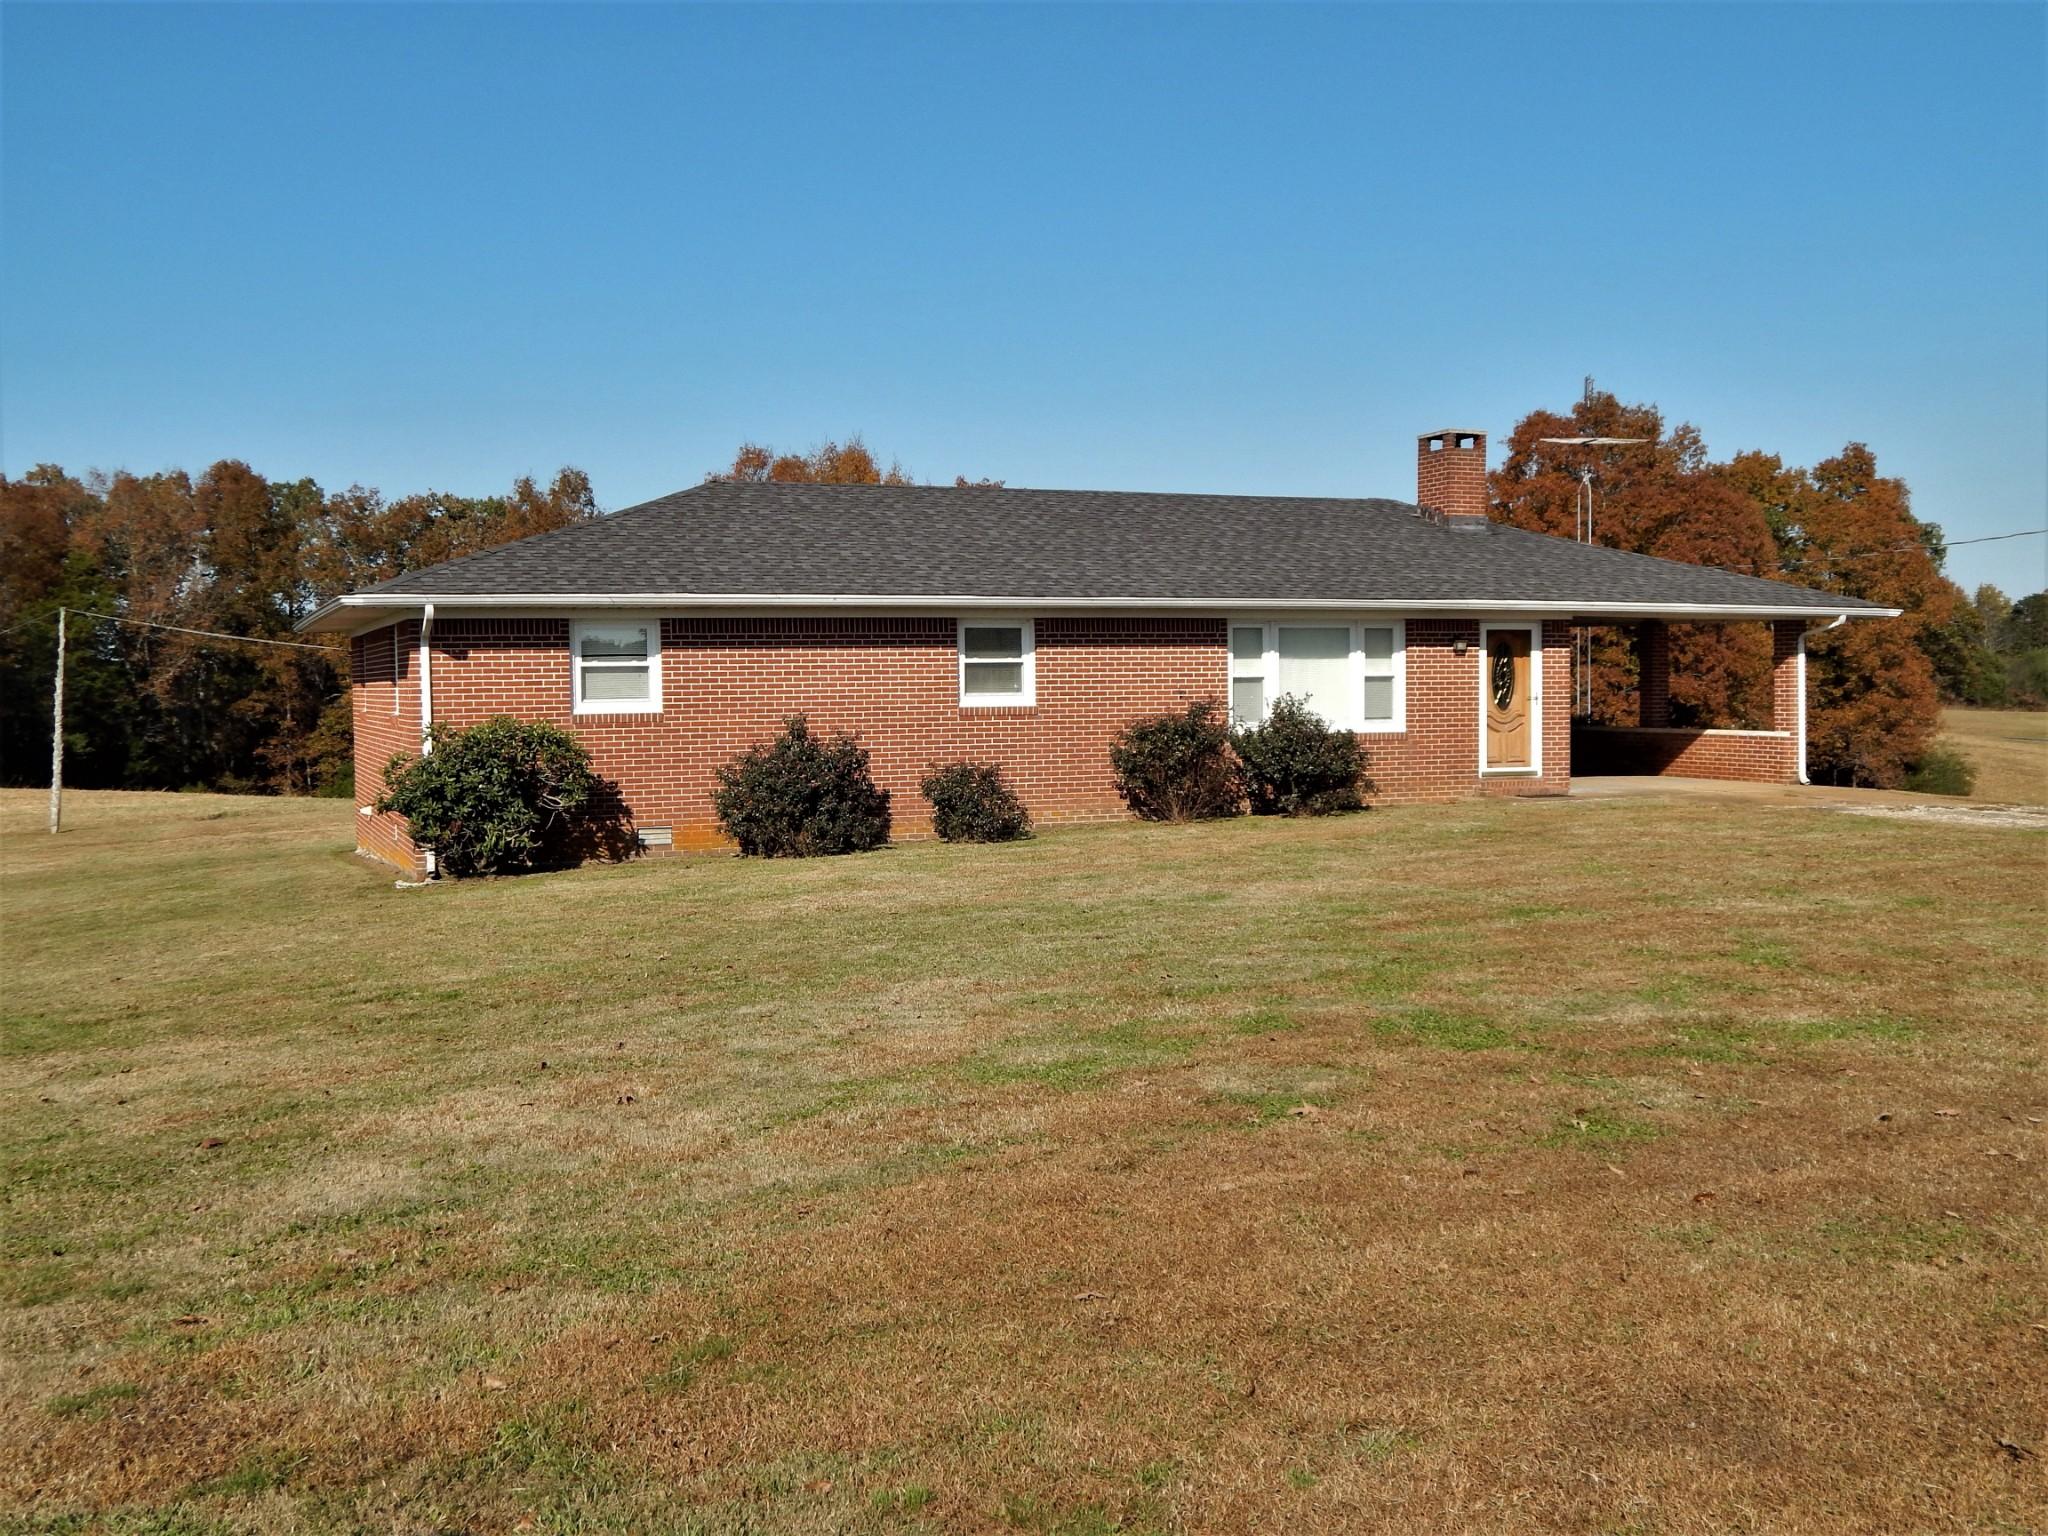 5206 Rayburn Creek Rd, Collinwood, TN 38450 - Collinwood, TN real estate listing